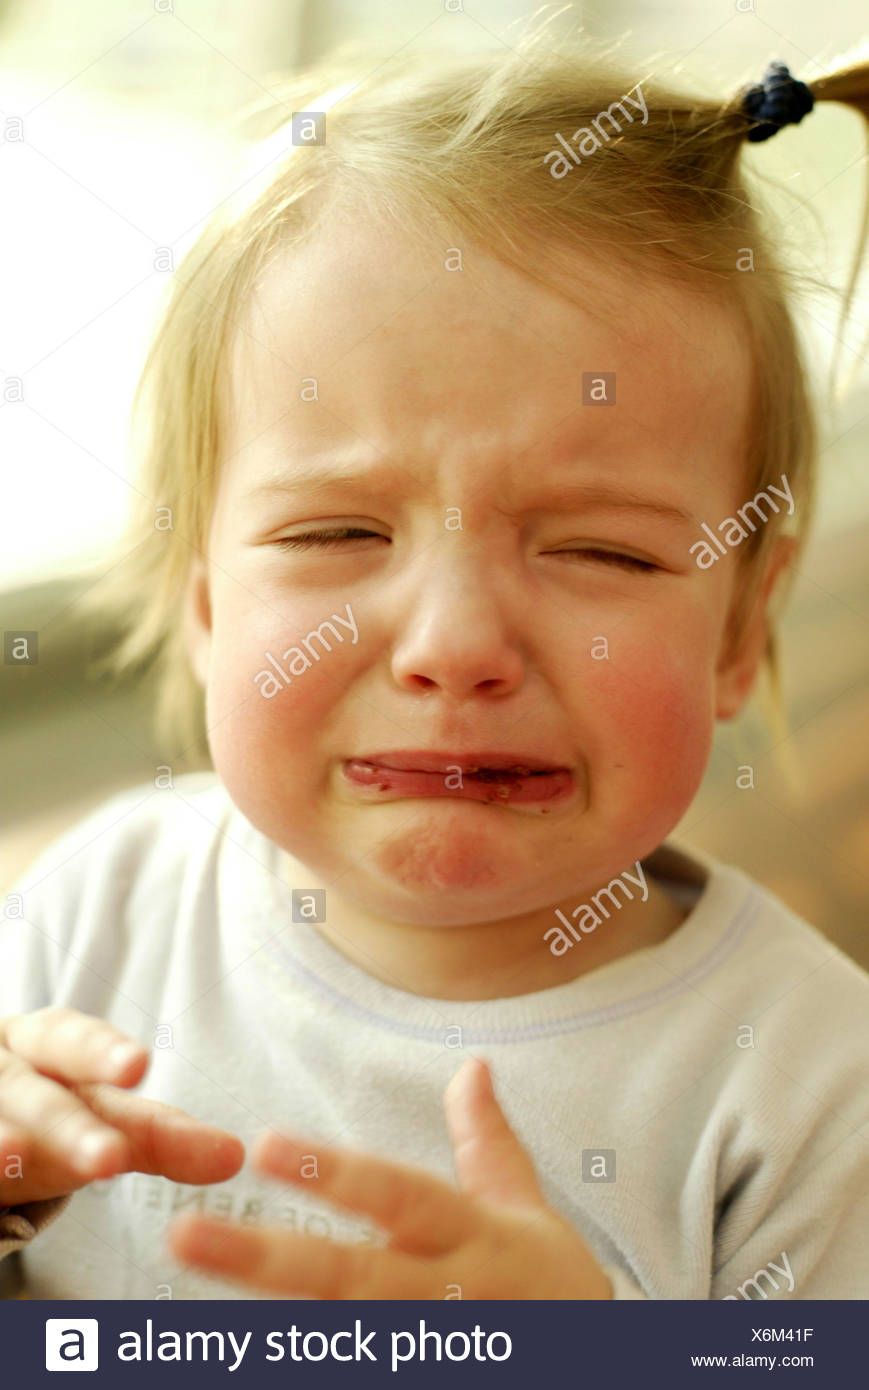 Girl, mouth, smears, cry, portrait, child portrait, child, 300 - 30